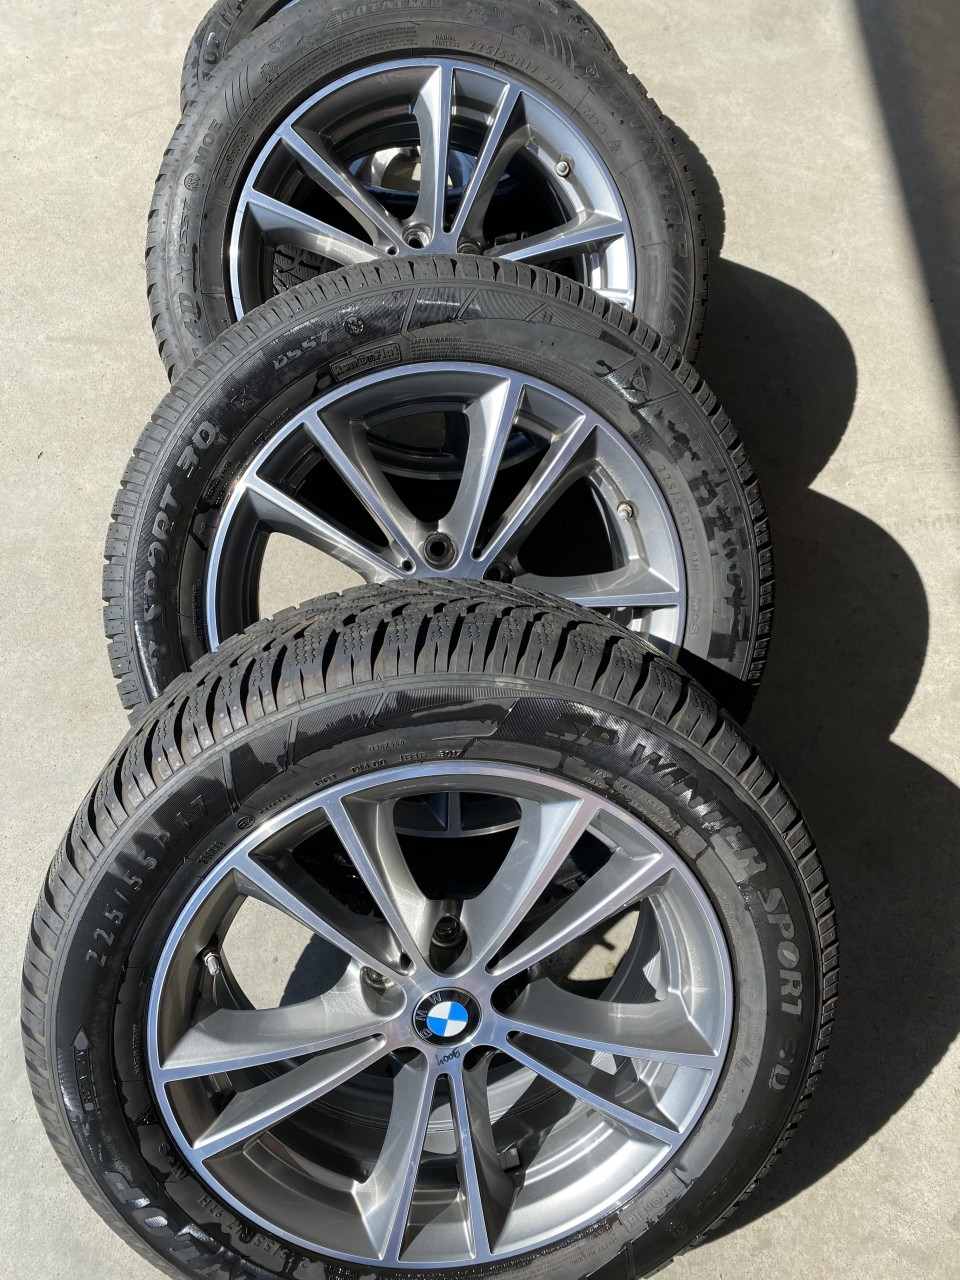 "Jante BMW originale 17"" PTR G30 G31 X1 X2 cu anvelope"